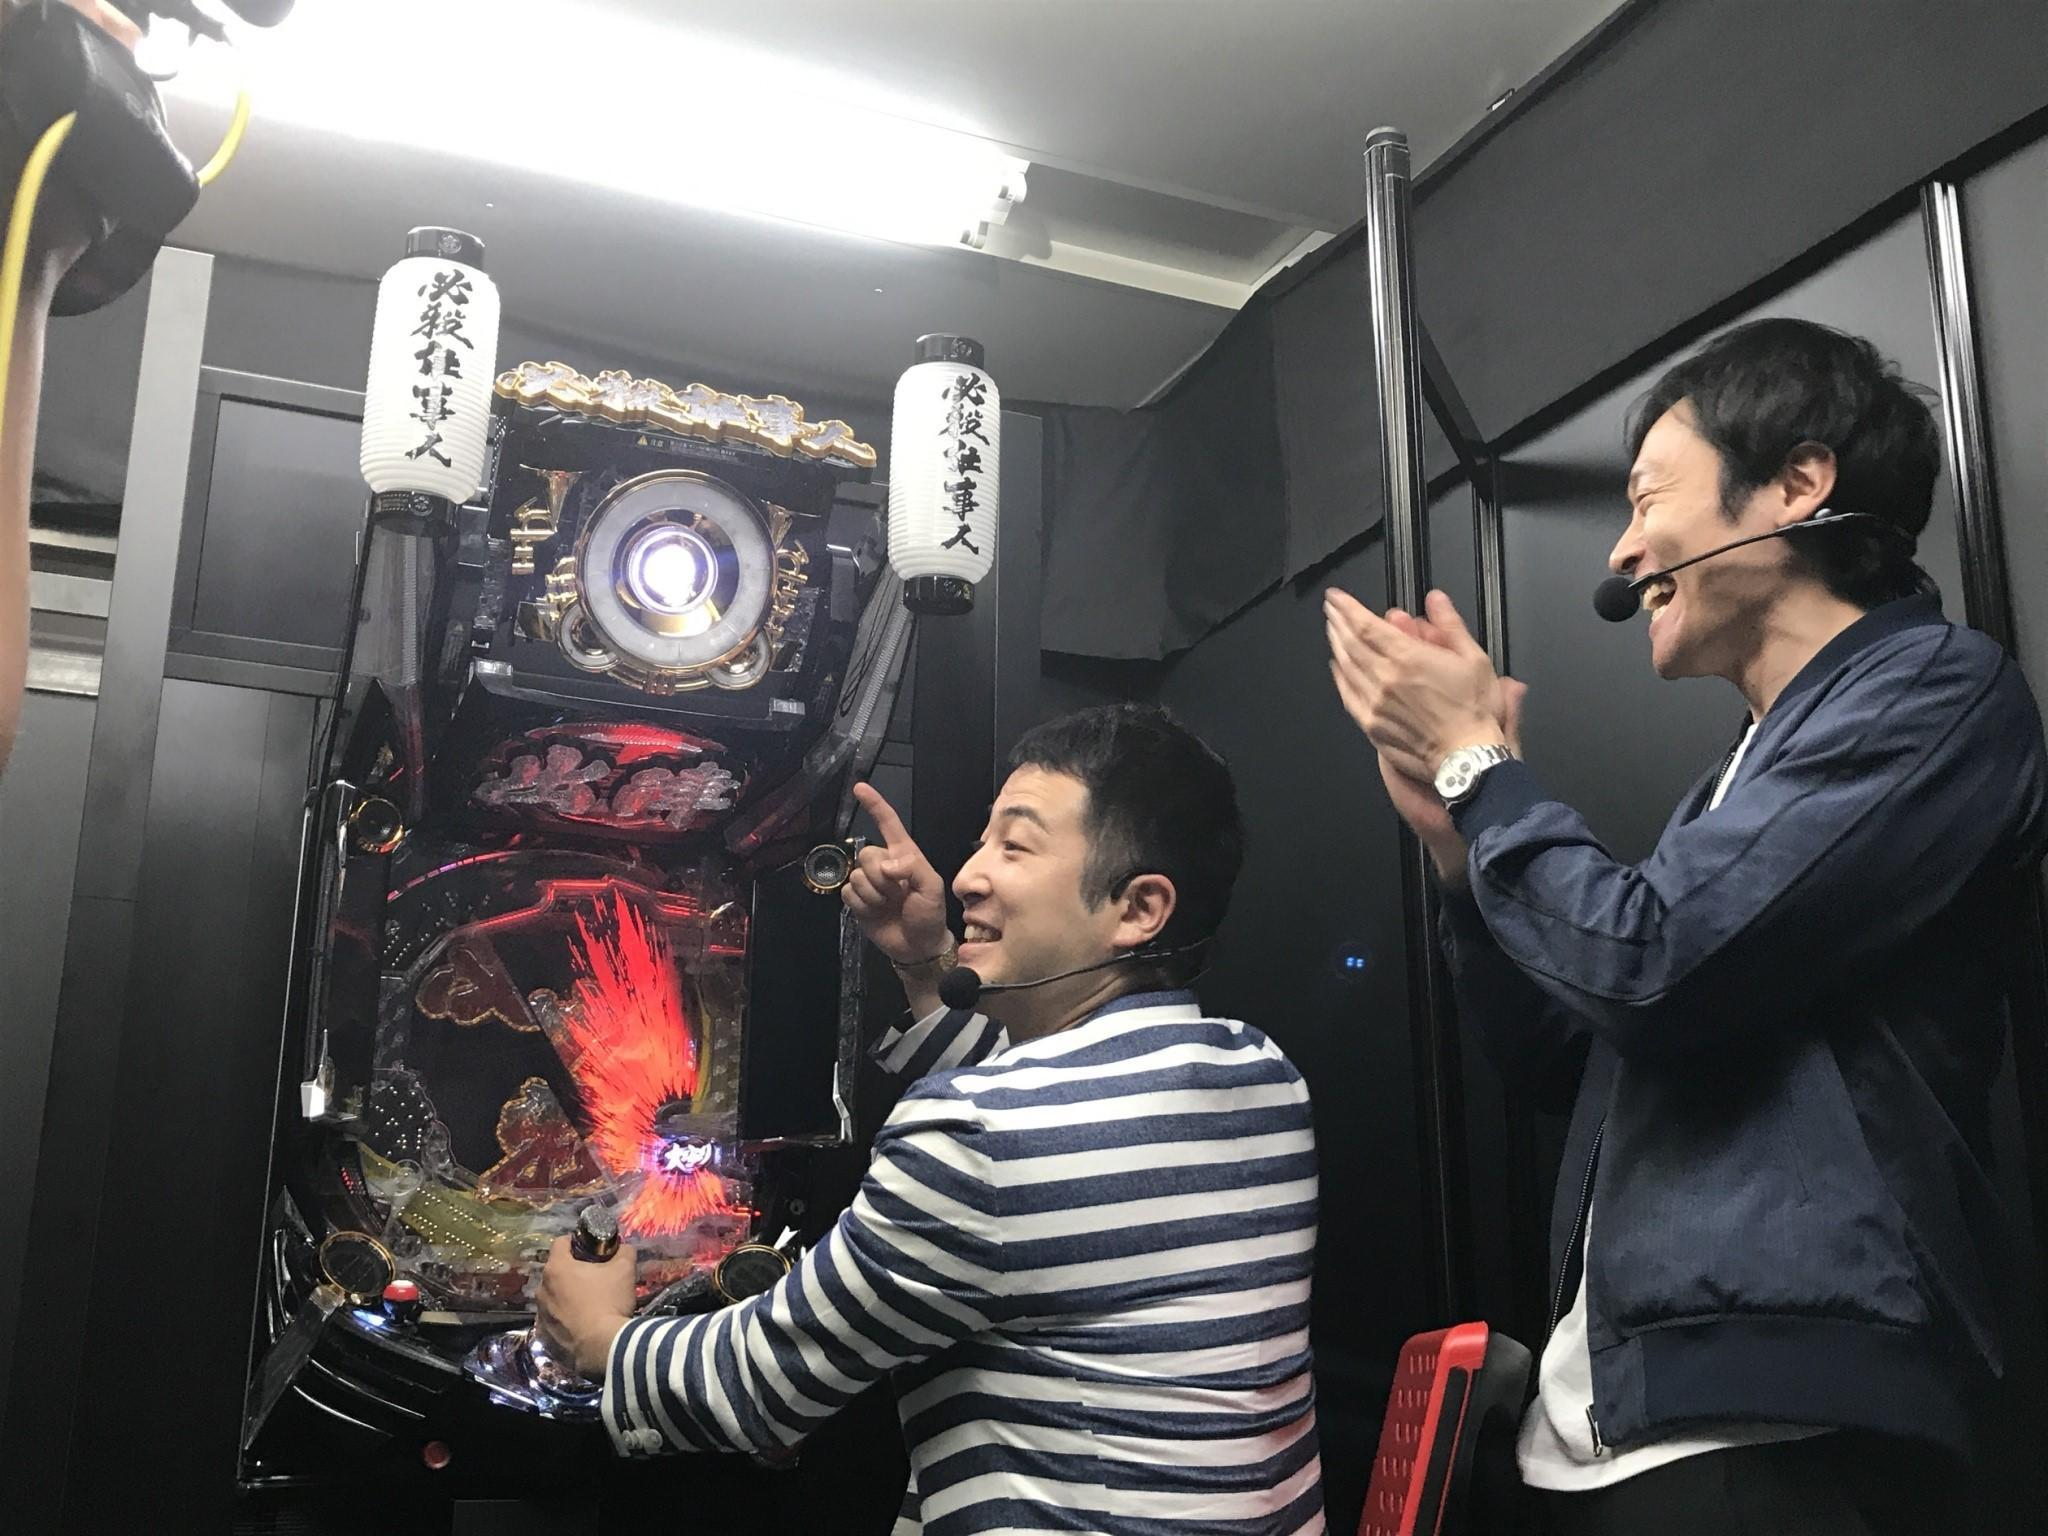 http://news.yoshimoto.co.jp/20170428175602-ddaa23cae7708a5b263d6a24fb8cbe870db221a3.jpg